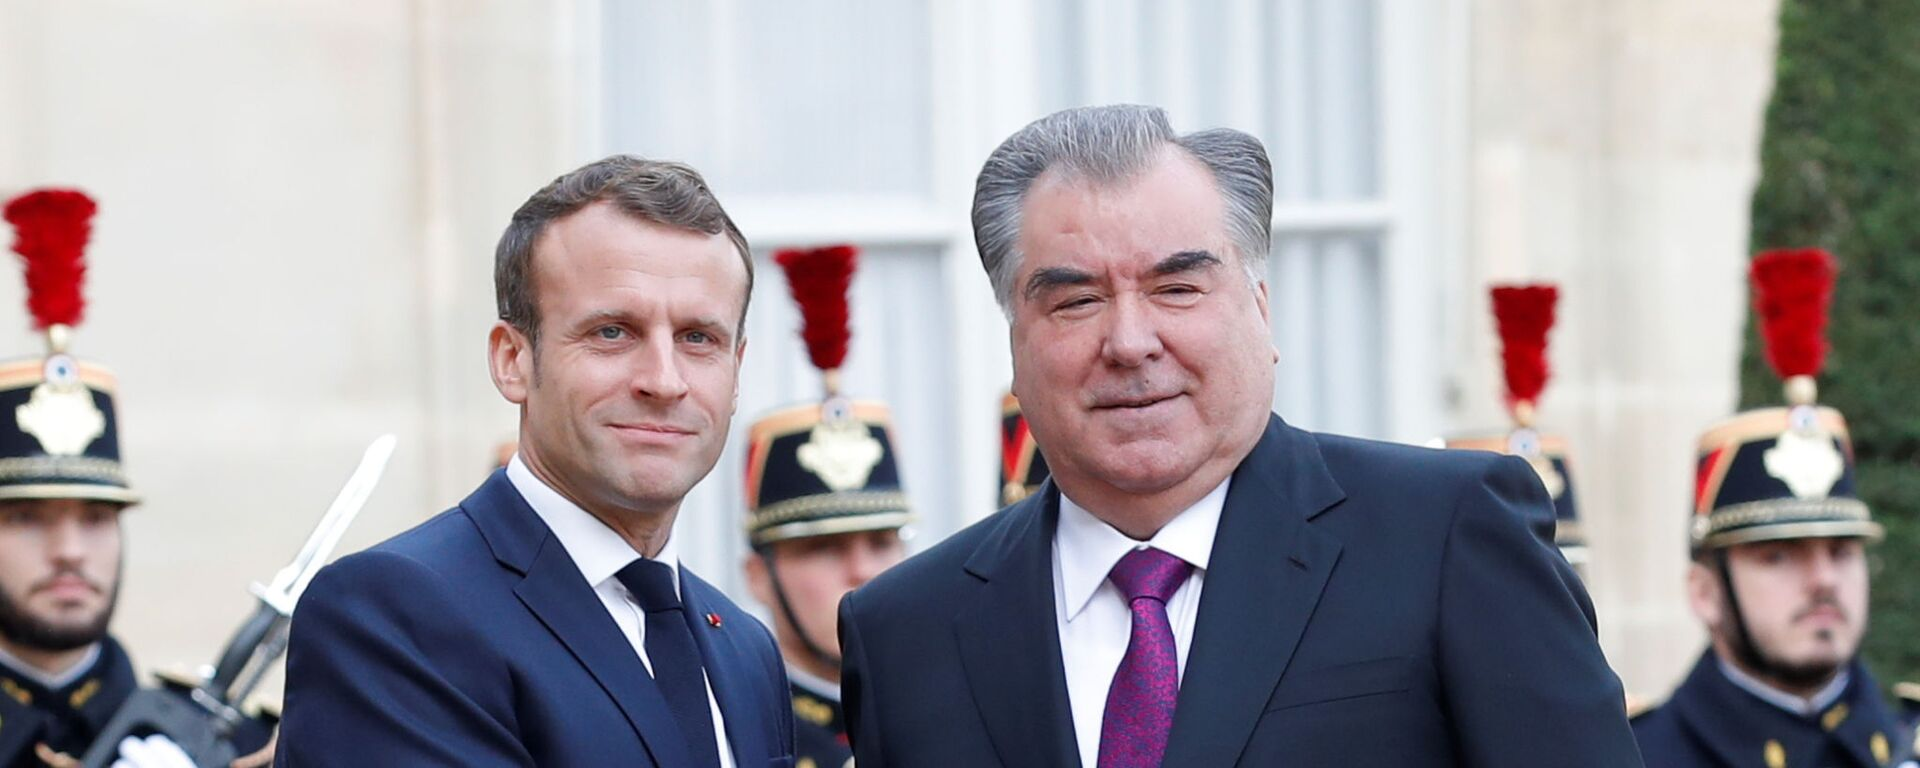 Президент Франции Эммануэль Макрон и президент Таджикистана Эмомали Рахмон - Sputnik Таджикистан, 1920, 25.08.2021